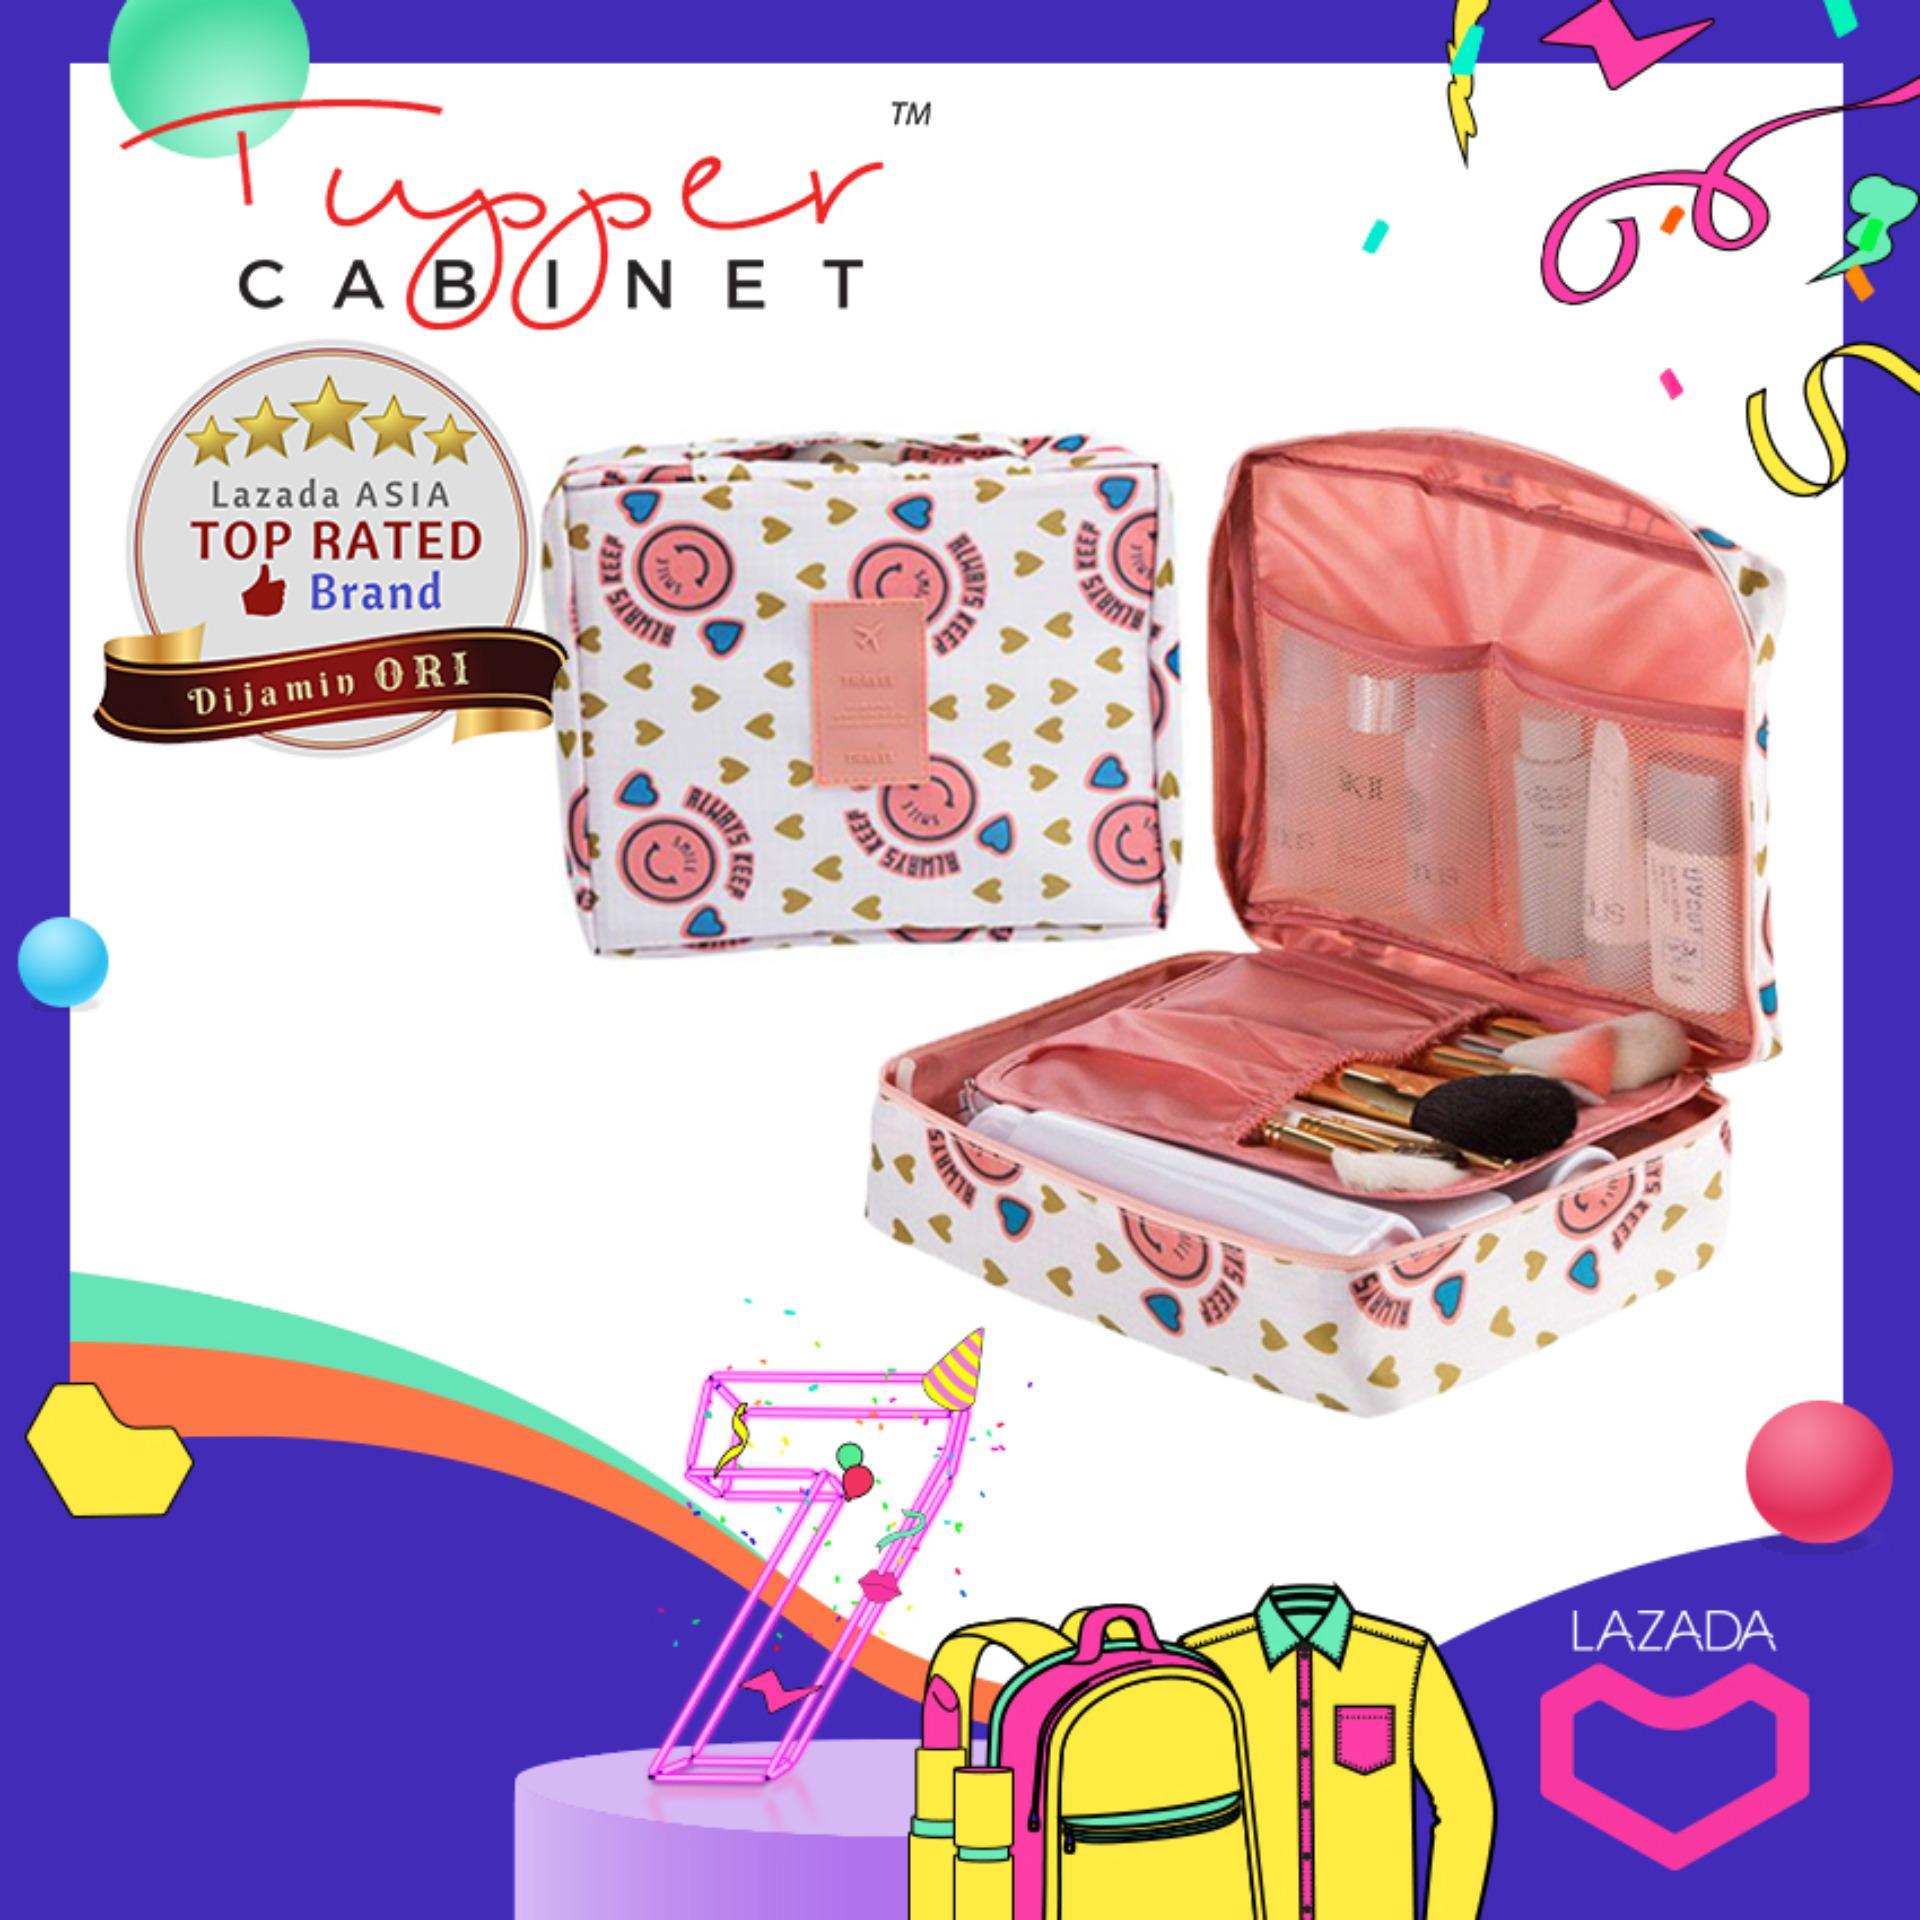 Tas Travel Pouch Kosmetik Tas Make up Organizer Toiletries Bag Tas Tangan  Sabun Mandi Makeup Toiletries 984931b892